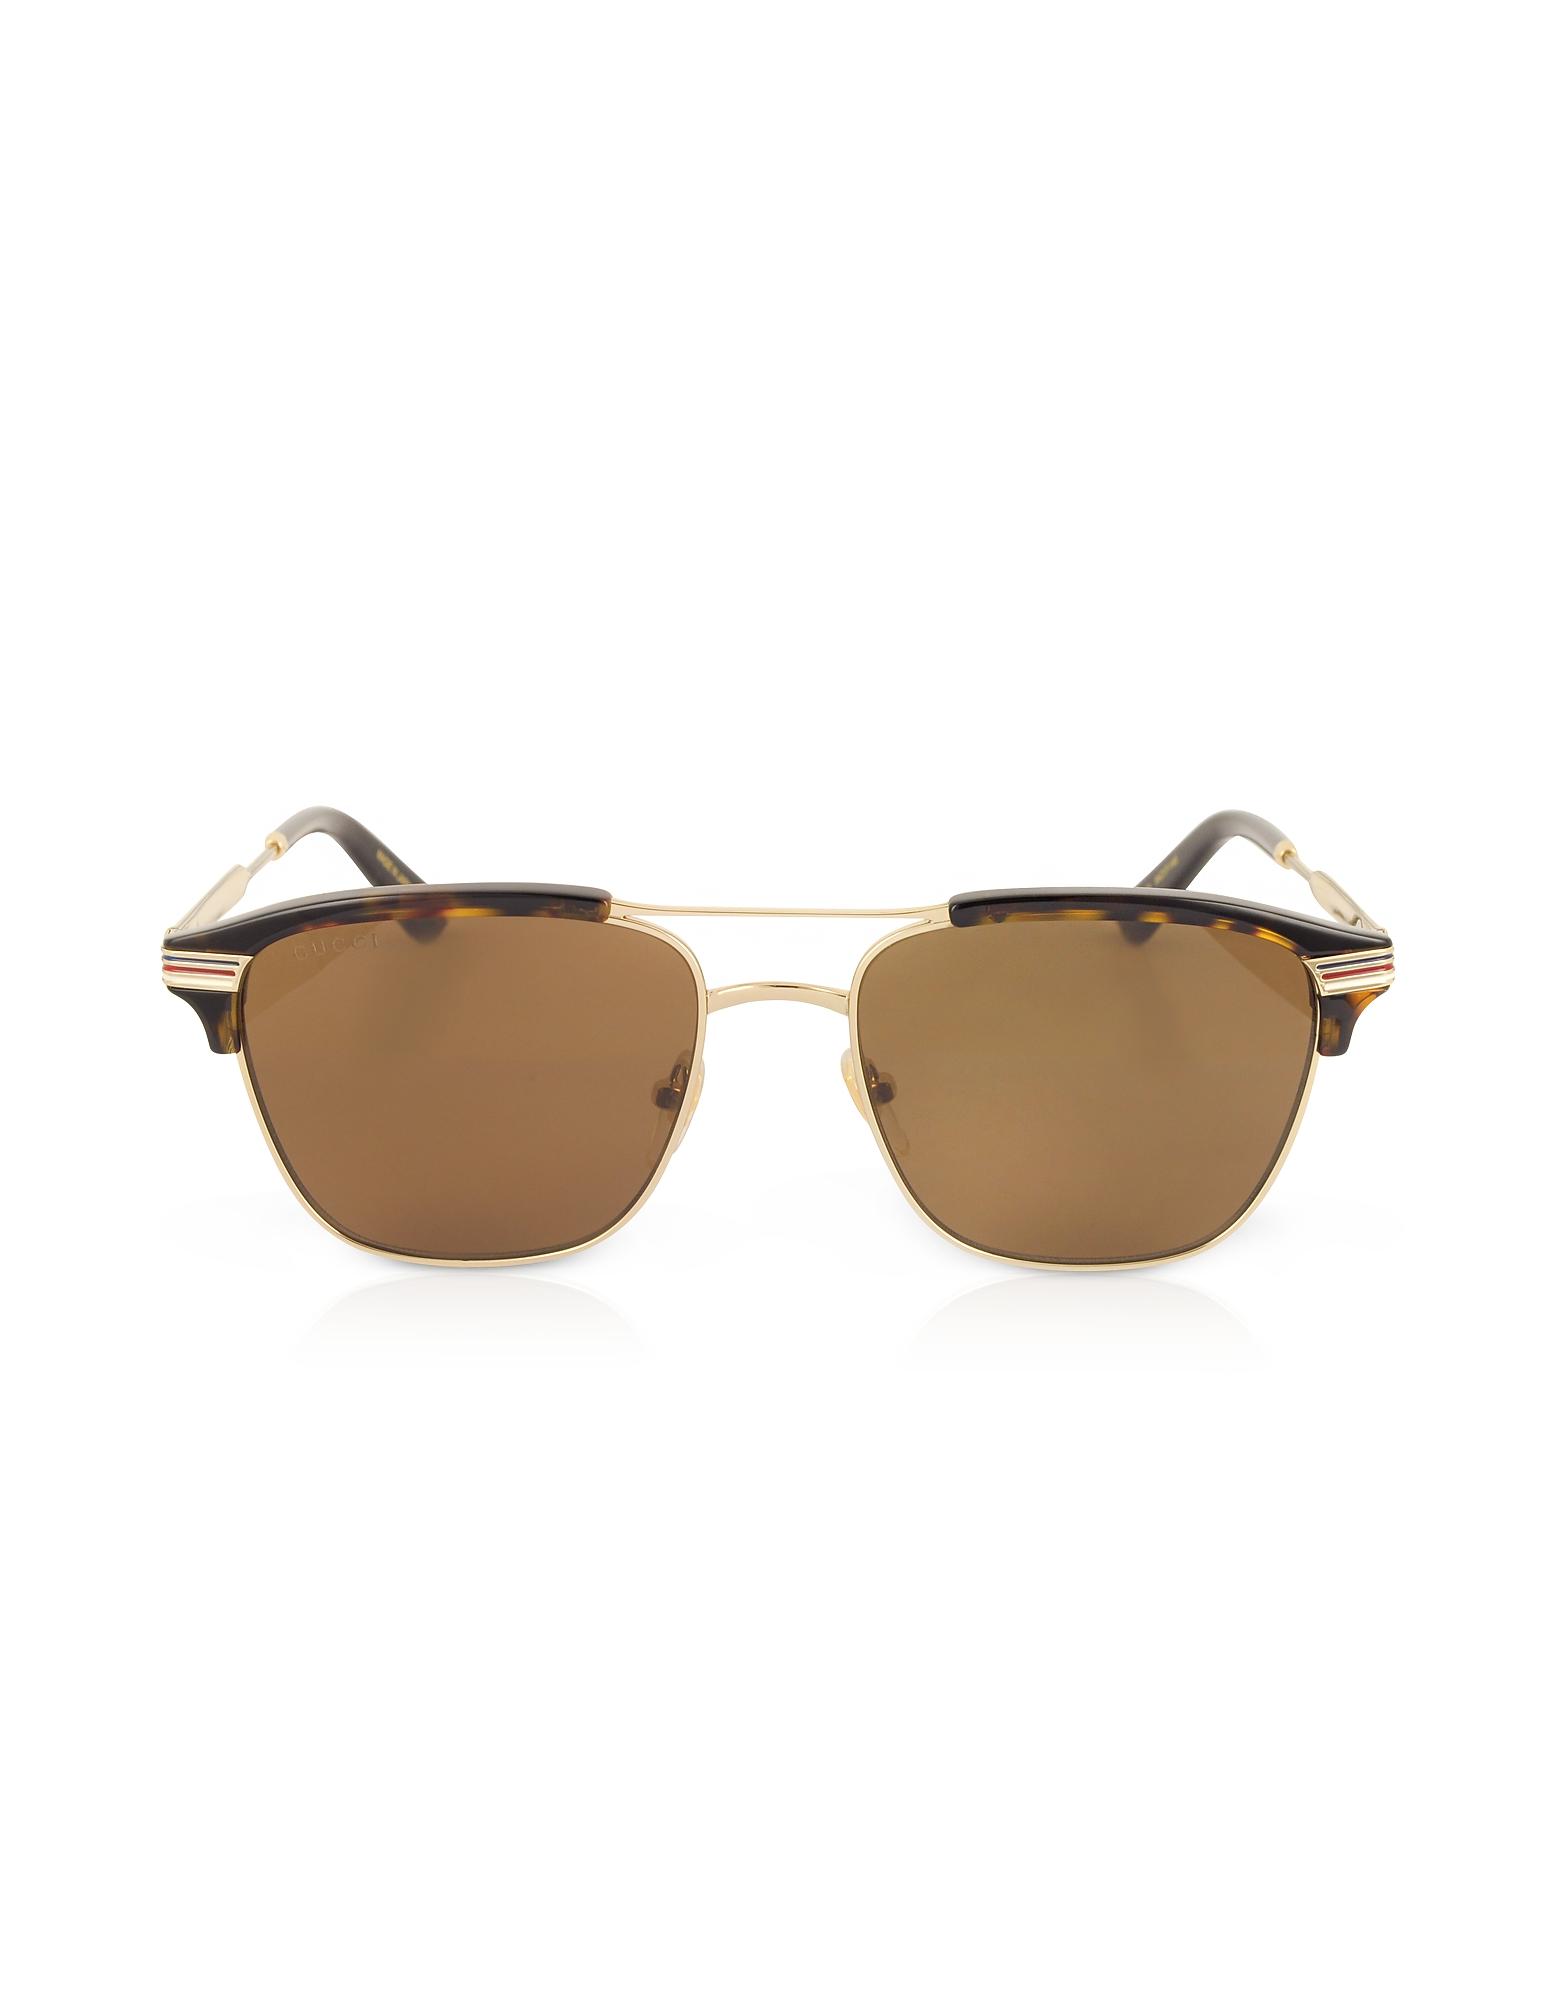 Gucci Designer Sunglasses, GG0241S 002 Square-frame Metal Sunglasses